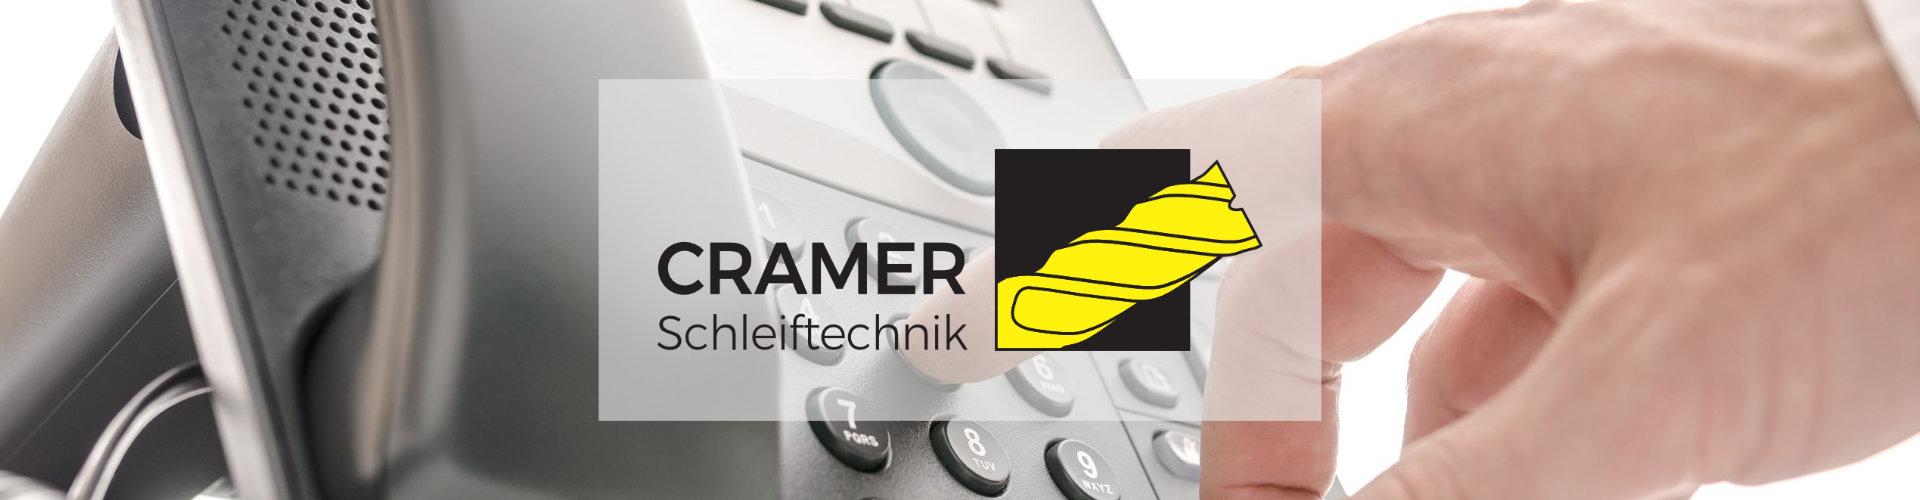 CRAMER Schleiftechnik Kontakt